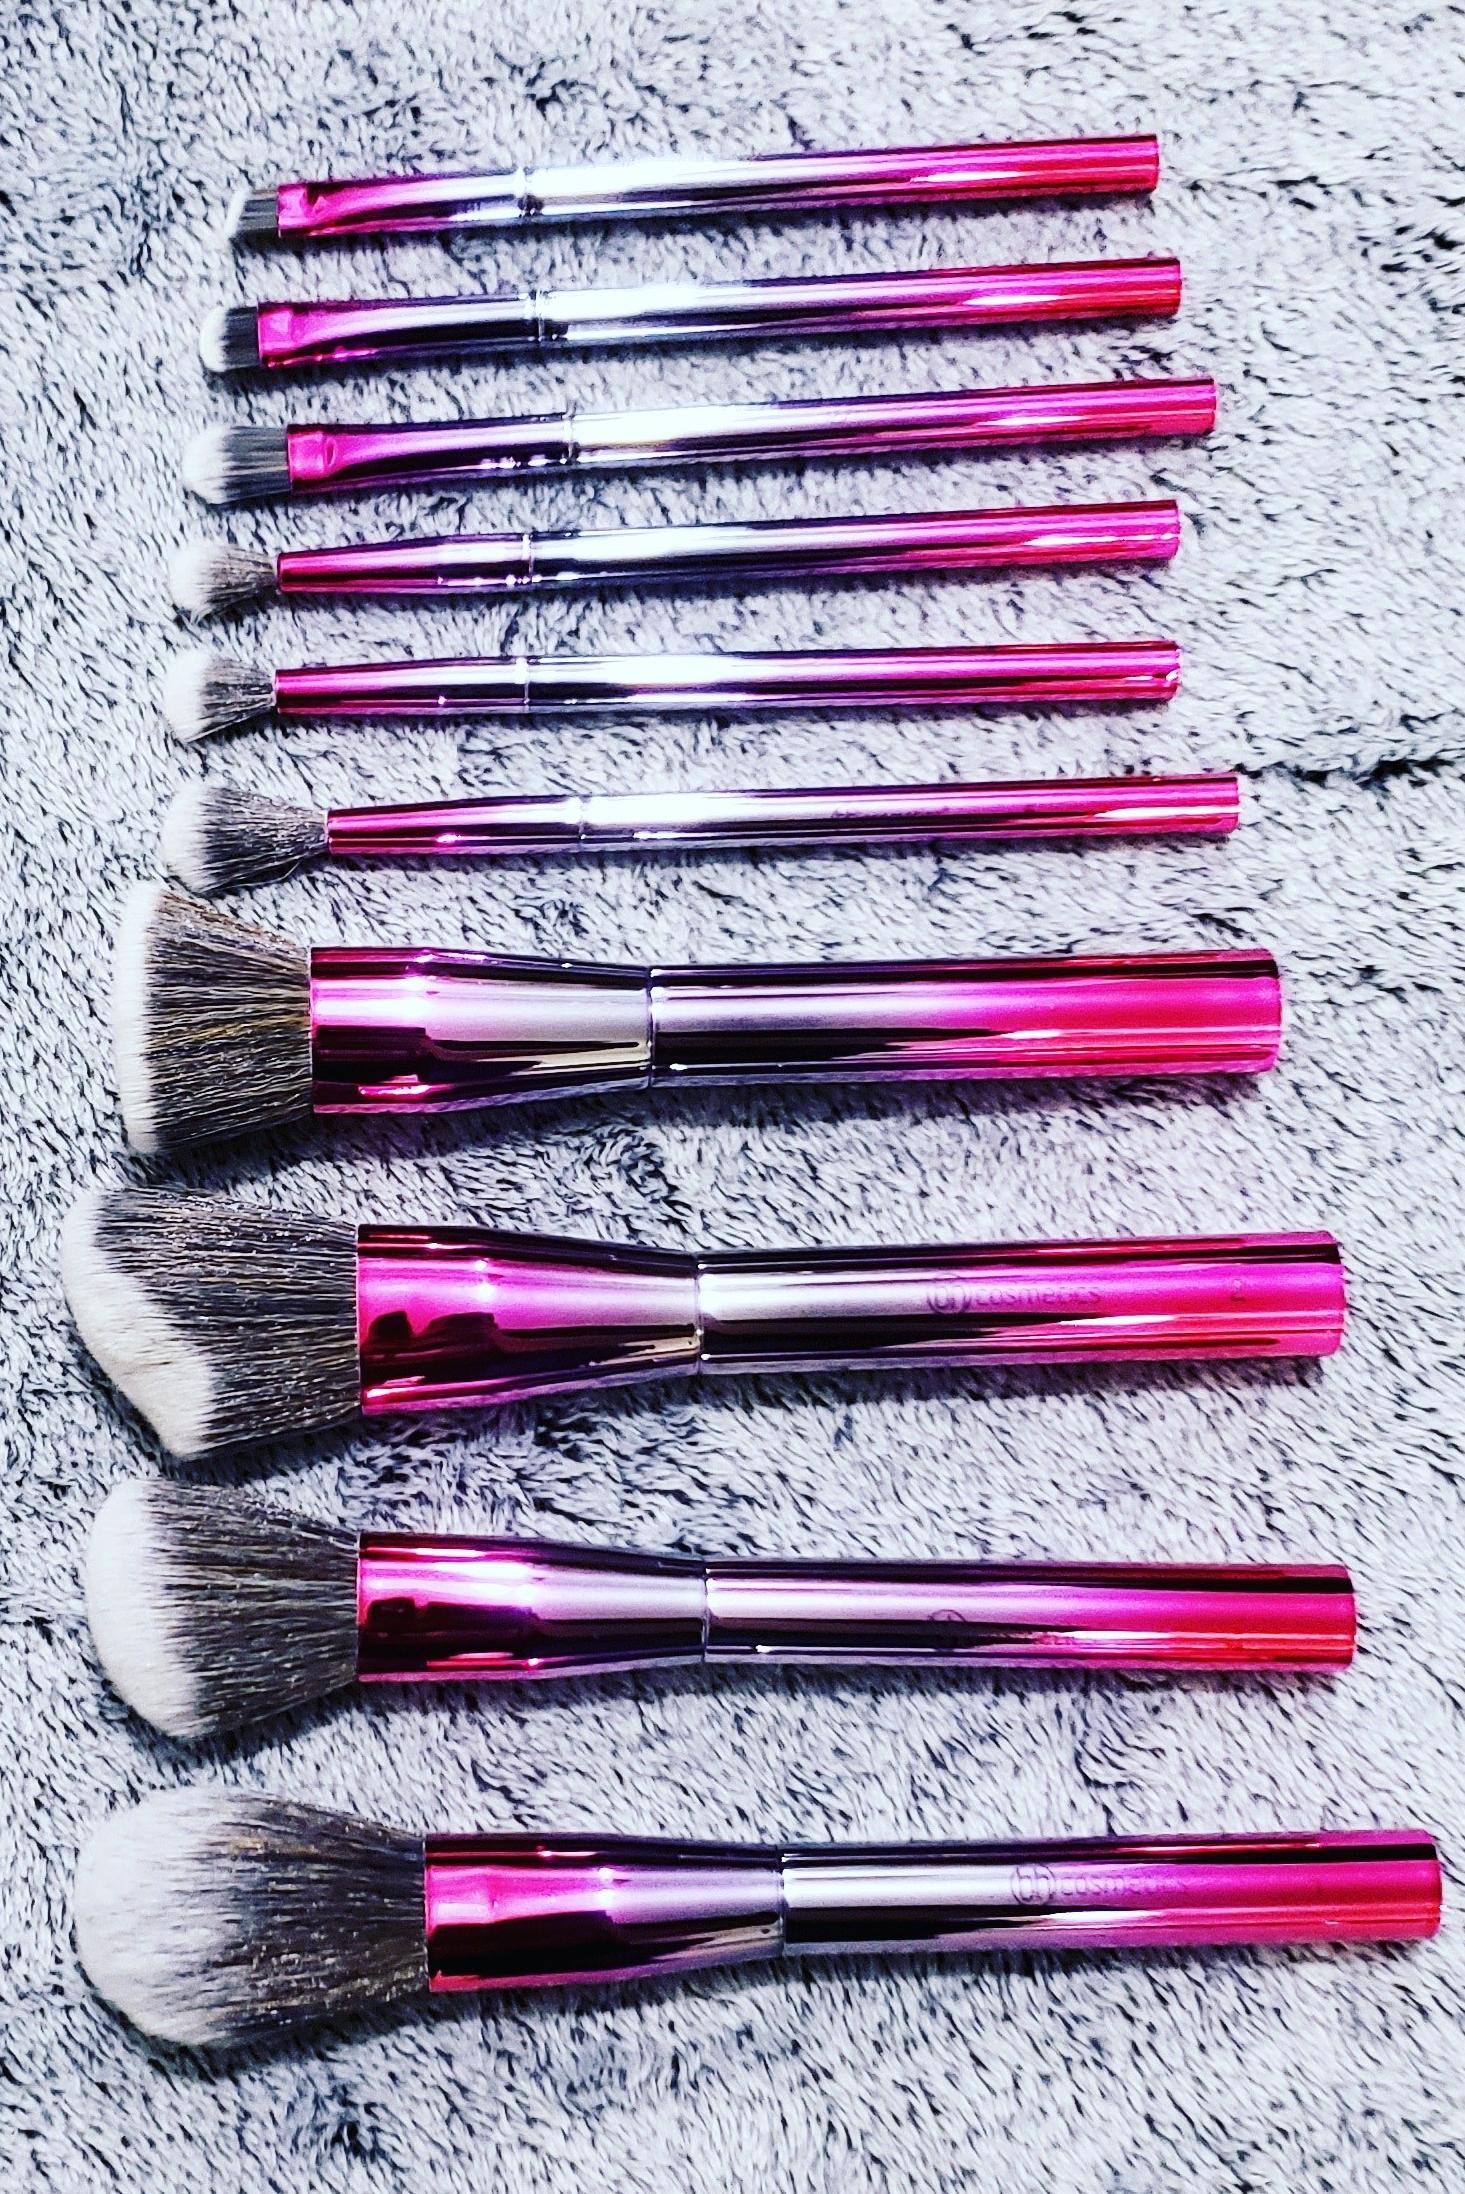 701914fac93235 lastdaysofthecoliseum - Bh Cosmetics Royal Affair Brush Set